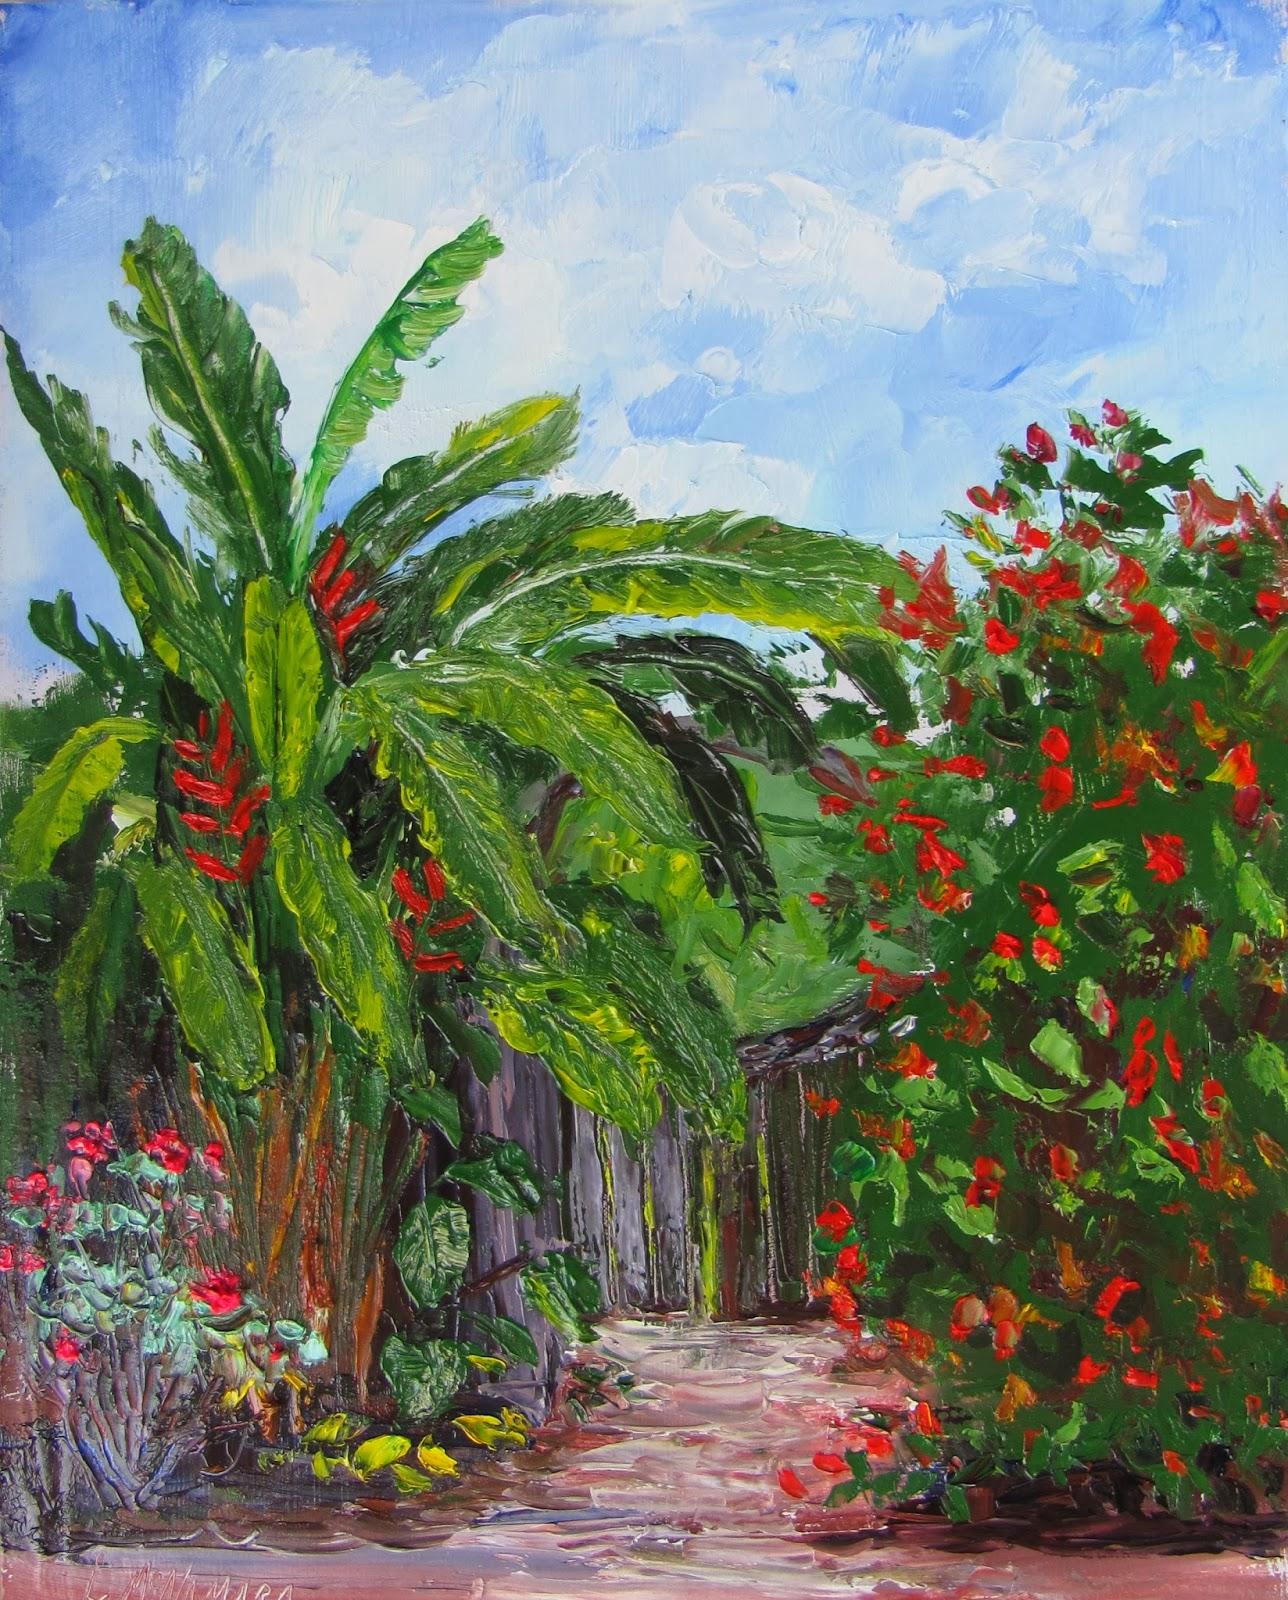 Heathcote Botanical Gardens: Lori's Stormy Art And Daily Paintings: 1529 SOLD Heathcote